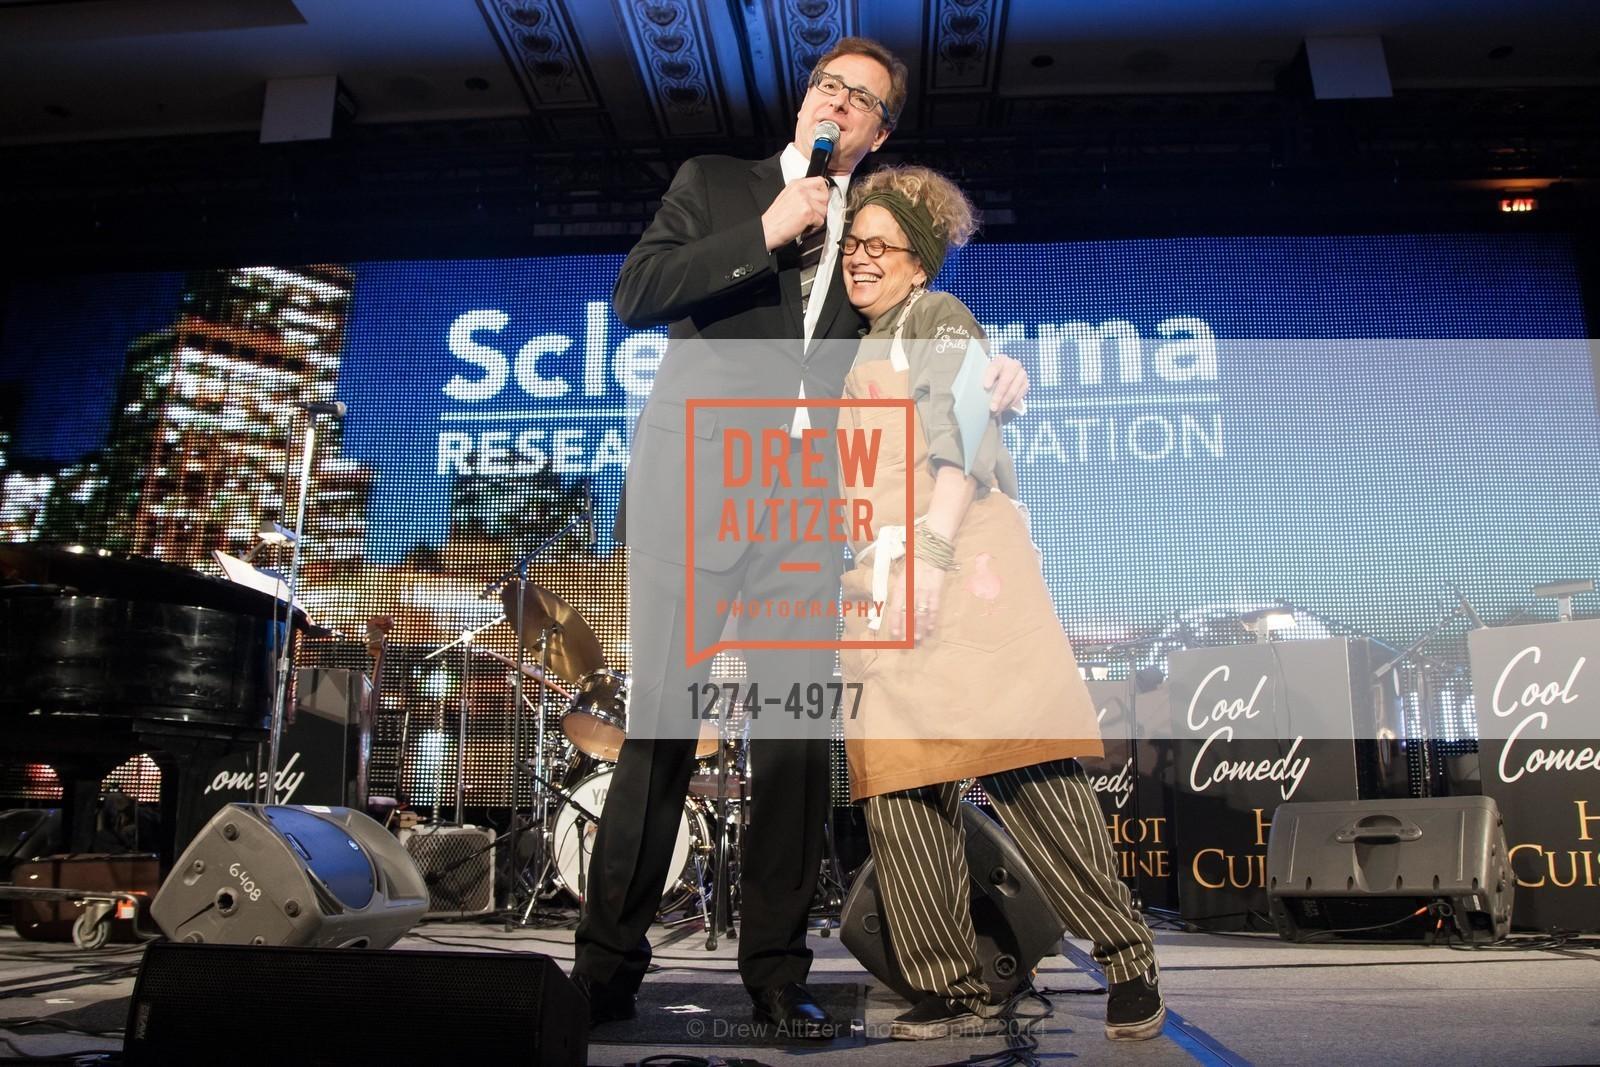 Bob Seier, Susan Feniger, Photo #1274-4977